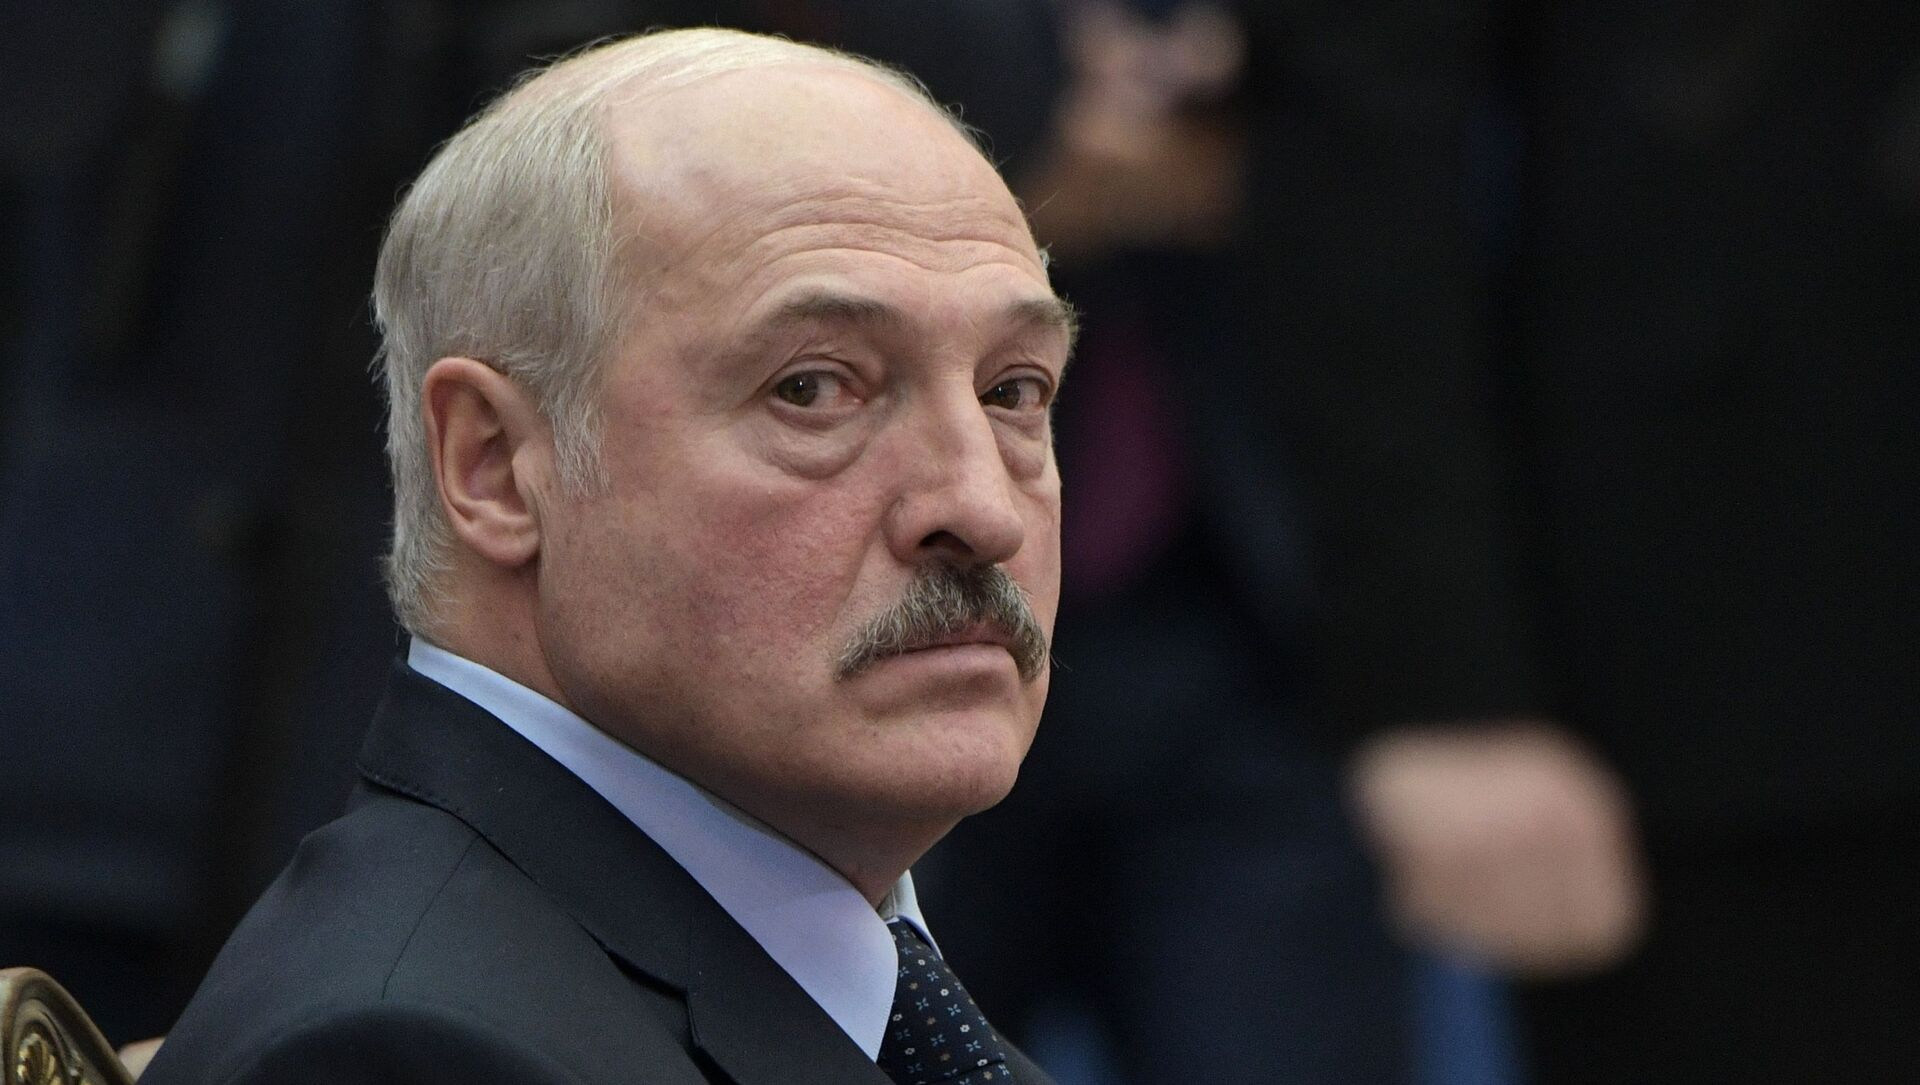 Президент Белоруссии Александр Лукашенко - Sputnik Армения, 1920, 09.02.2021